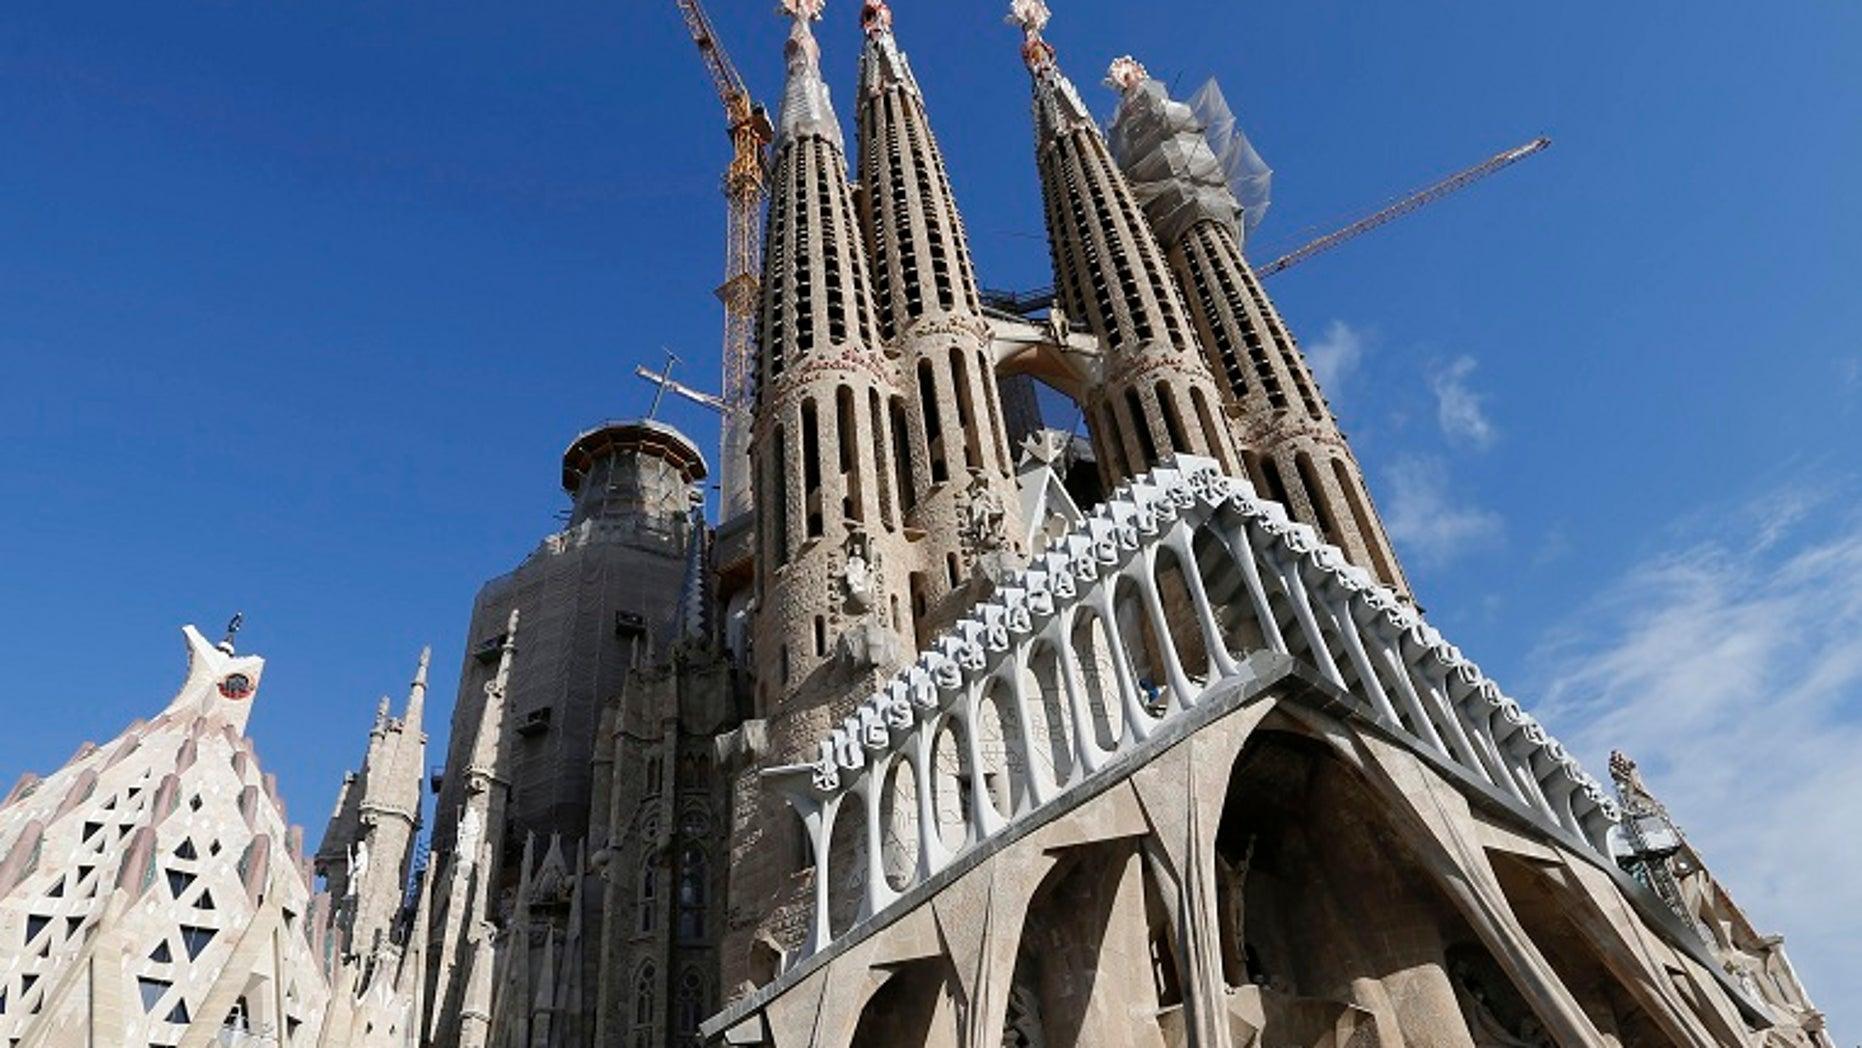 Barcelona's Sagrada Familia cathedral was evacuated Tuesday following a false alarm of terrorist activity.